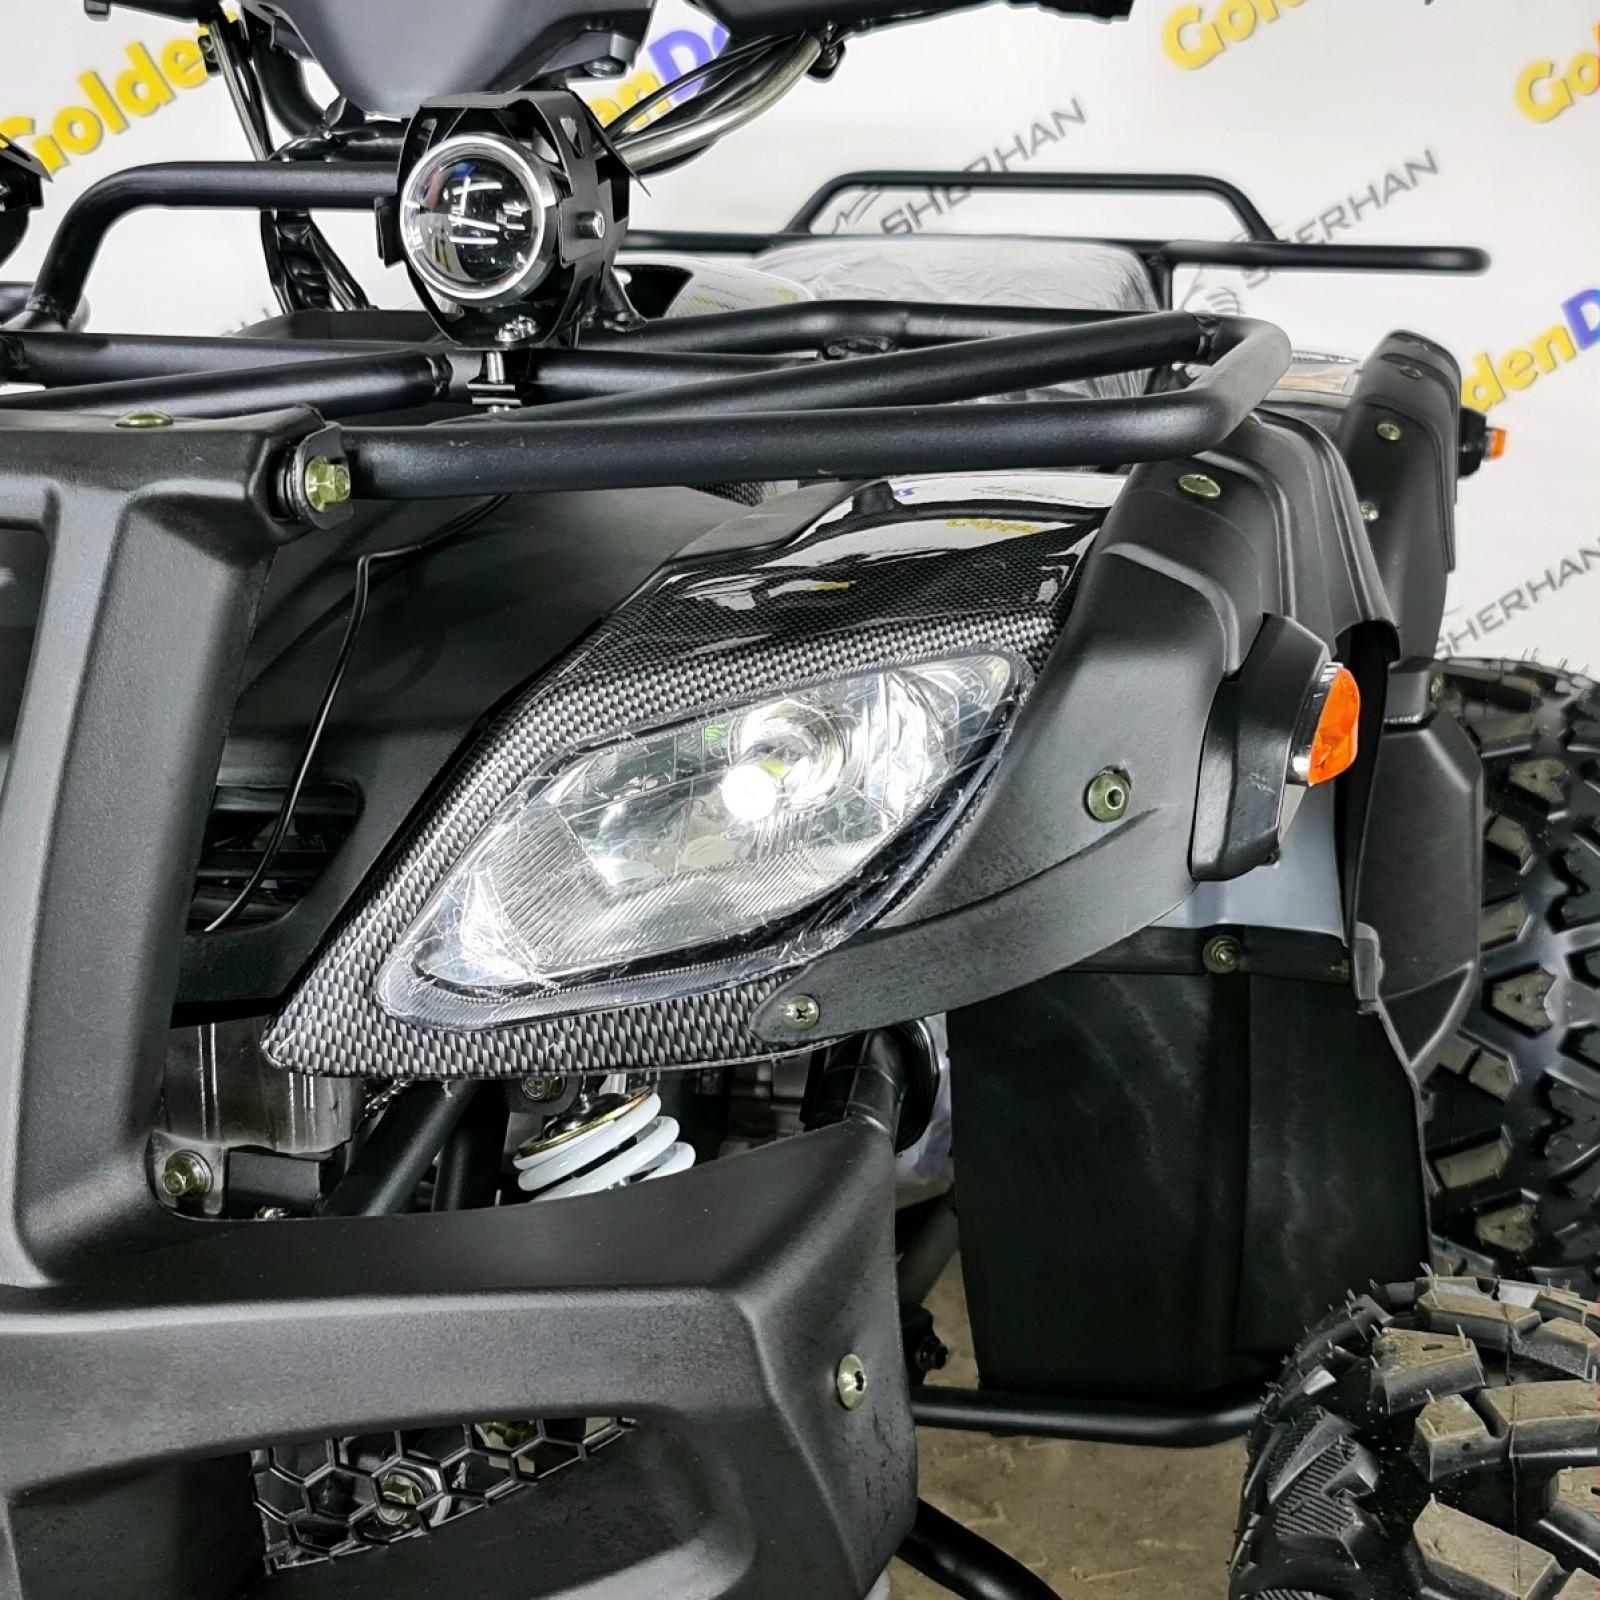 Квадроцикл Stalker-200 LUX